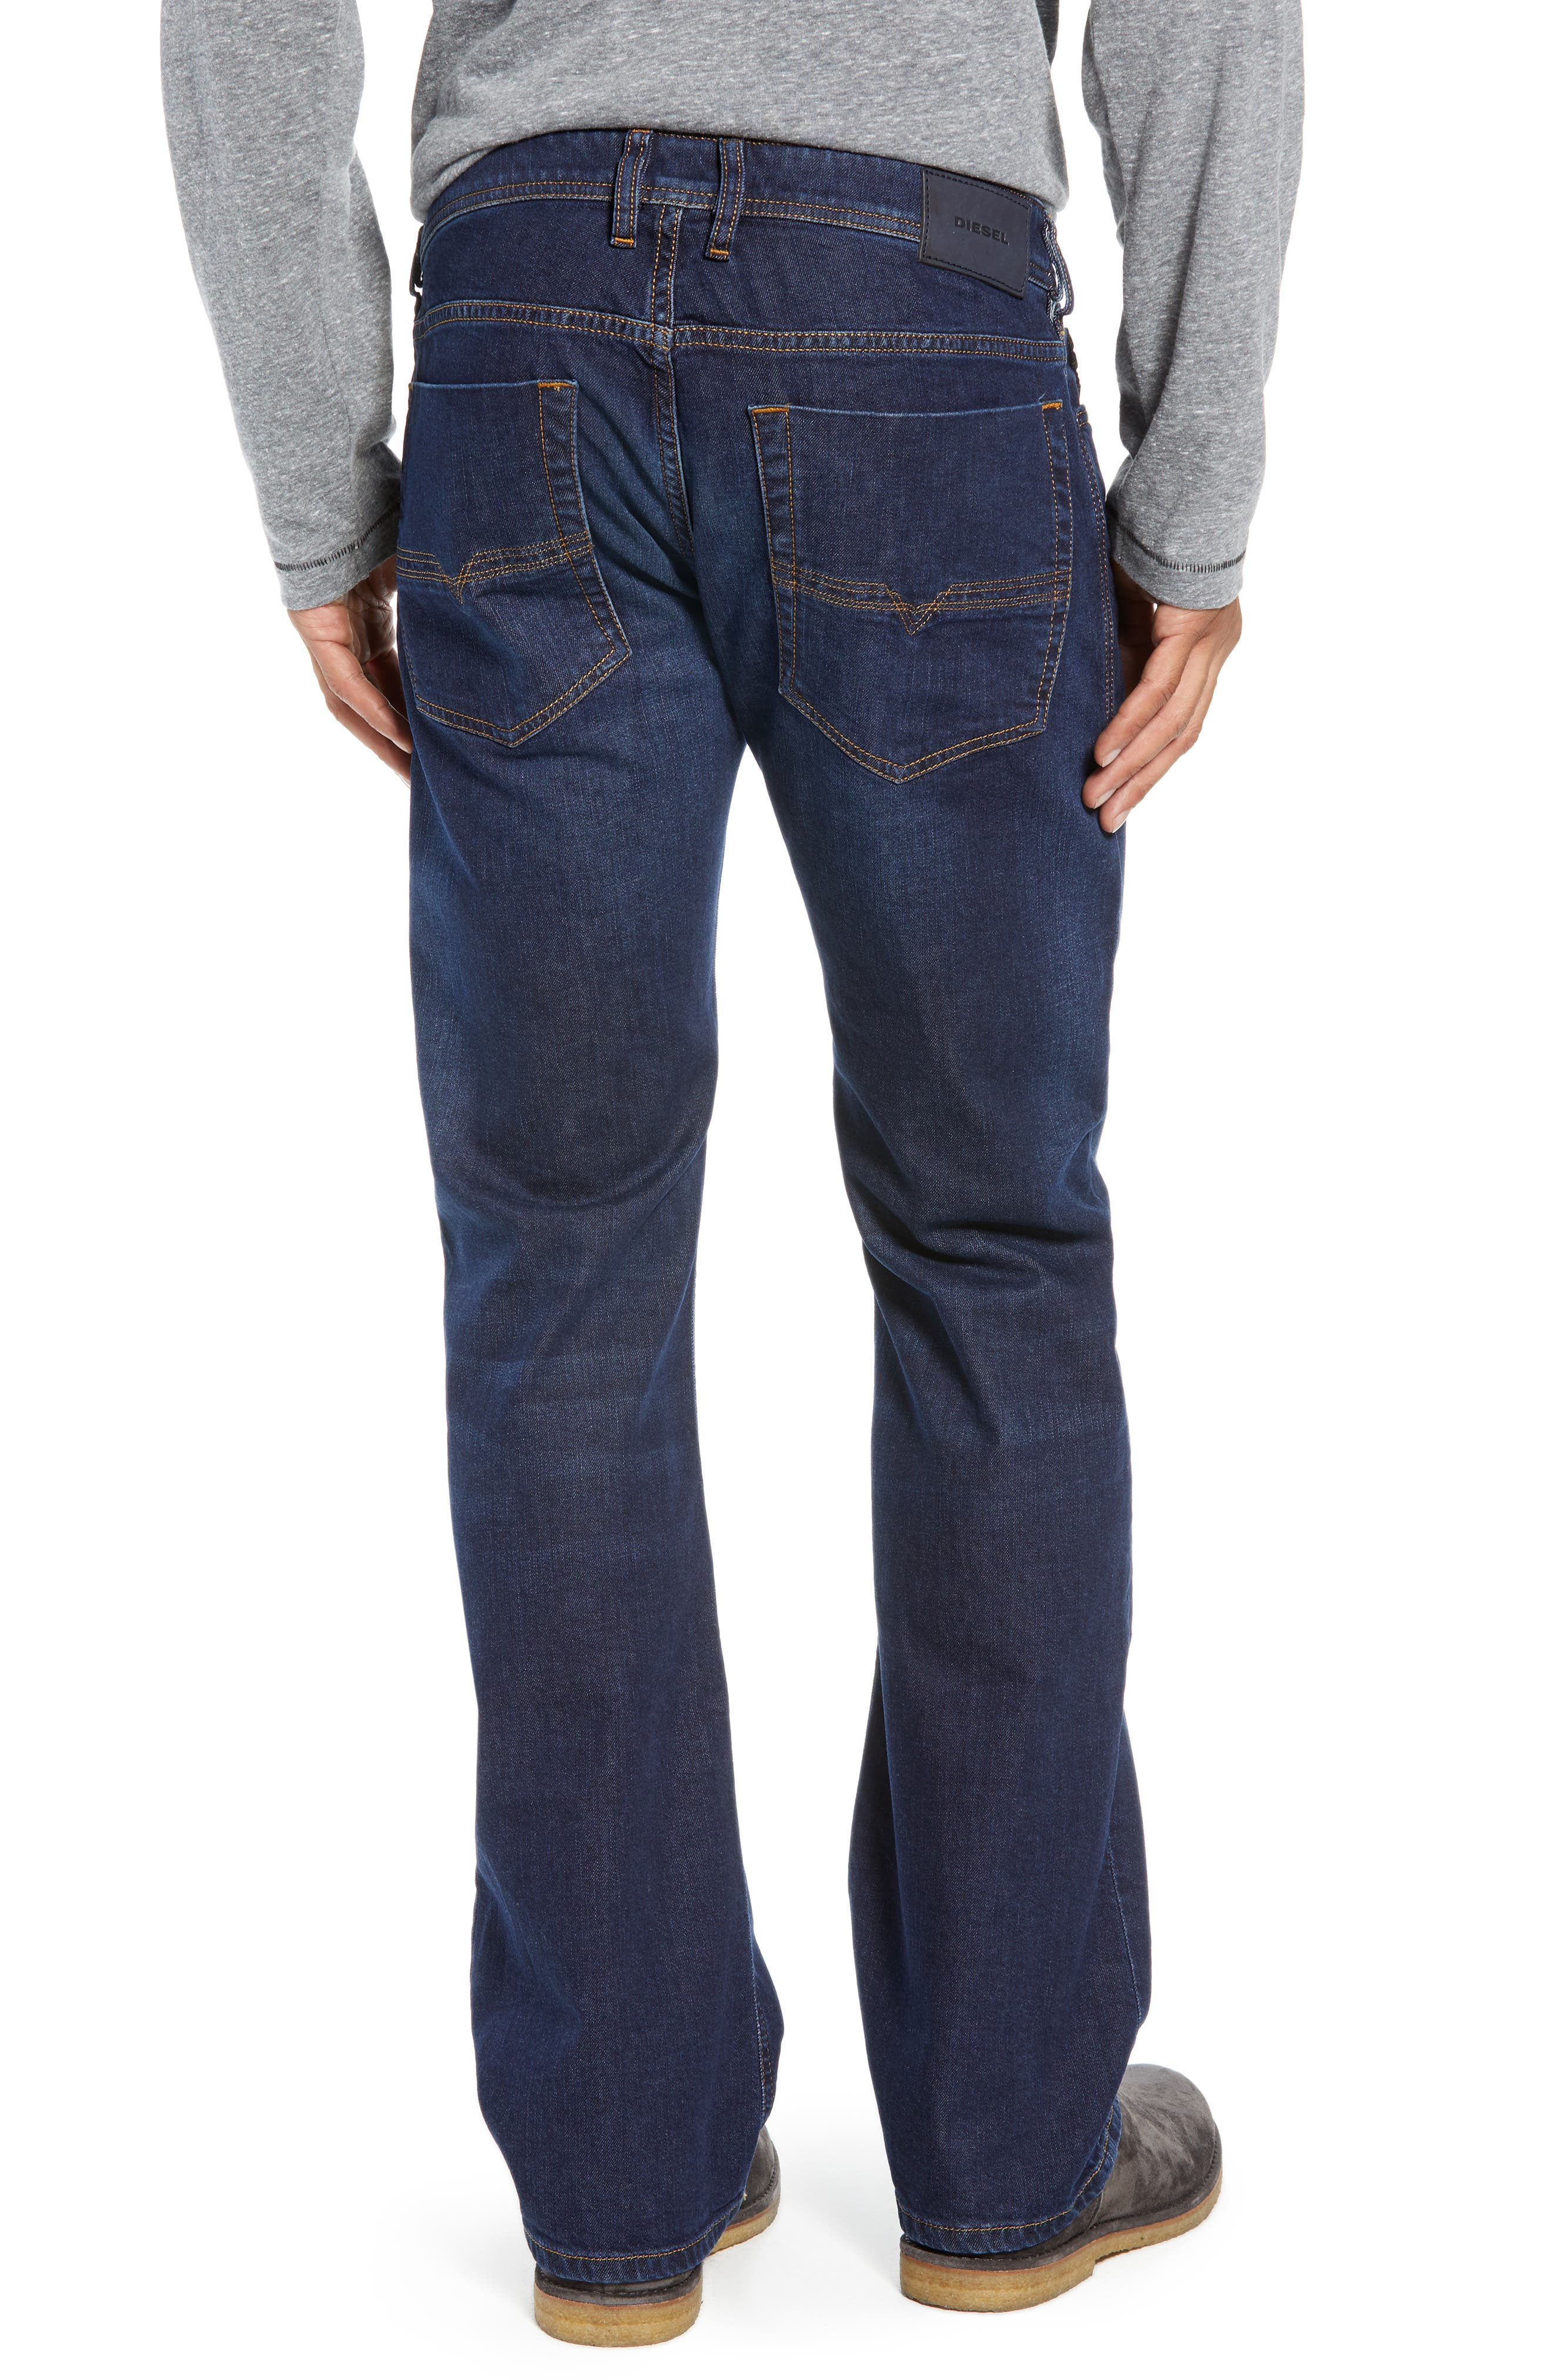 Zatiny Bootcut Jeans,                             Alternate thumbnail 2, color,                             084XH